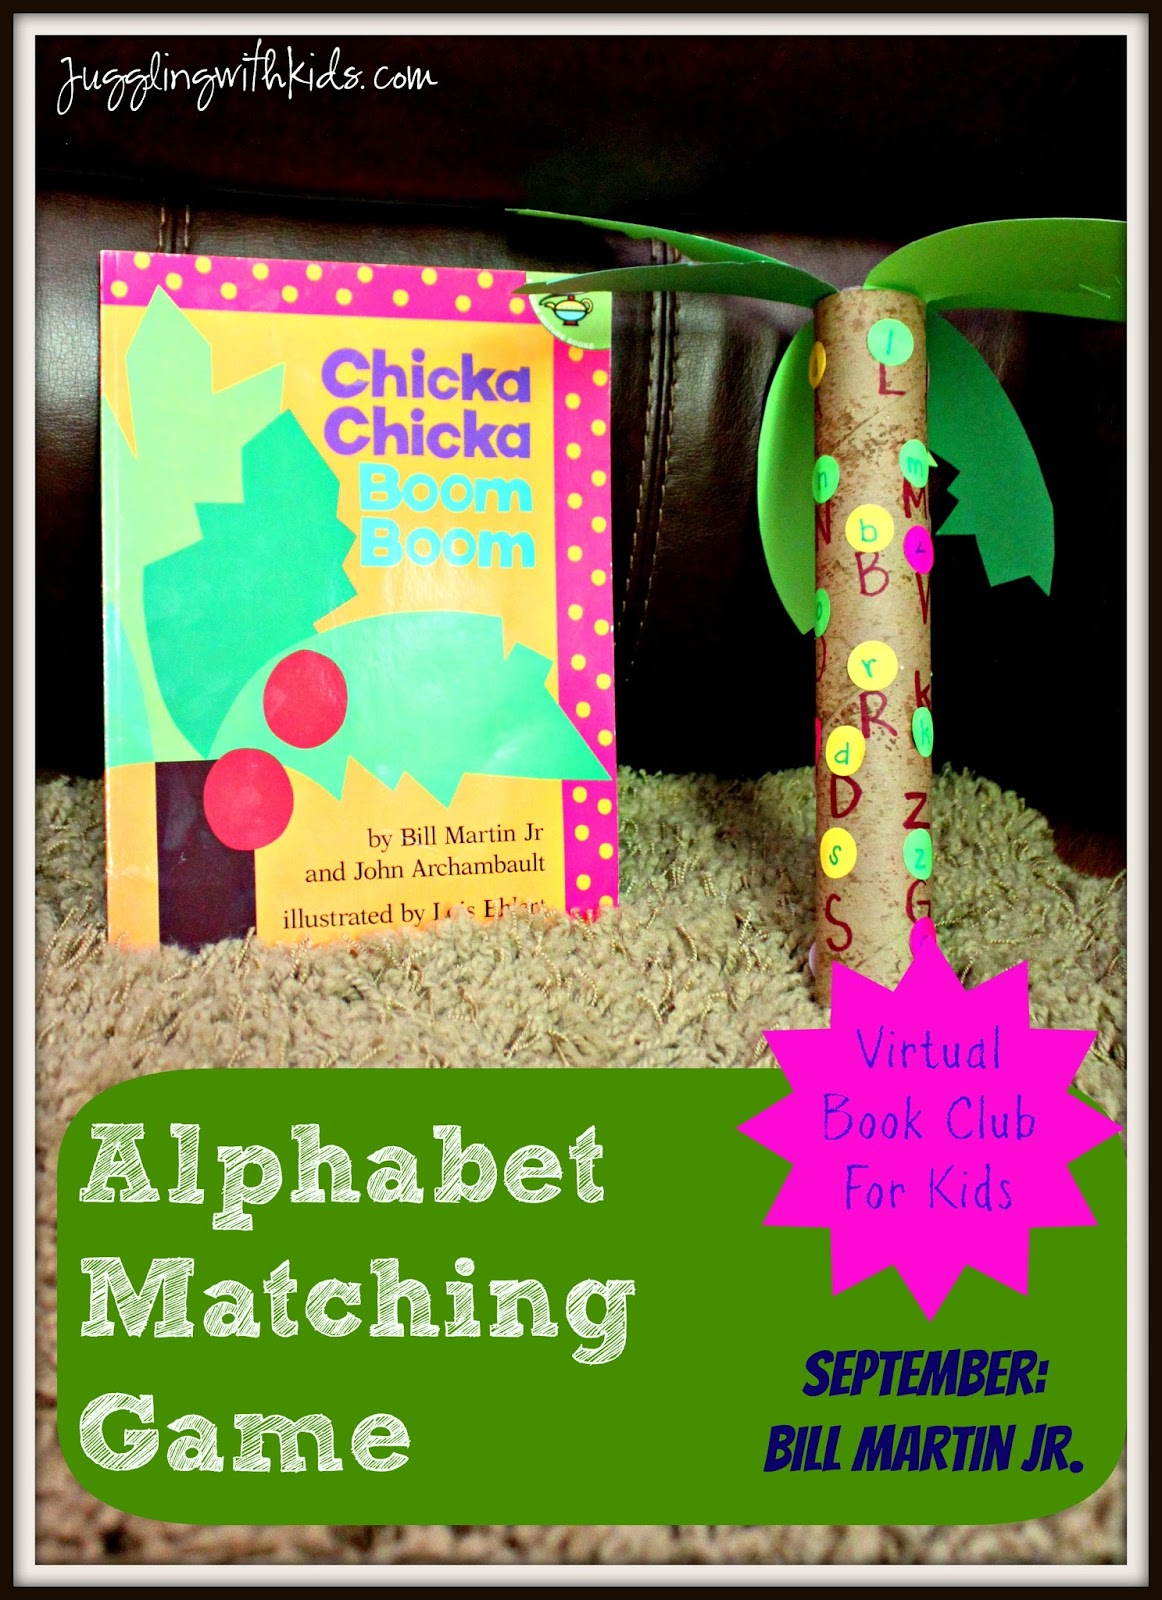 Chika Chika Boom Boom Alphabet Matching Game Virtual Book Club For Kids Juggling With Kids